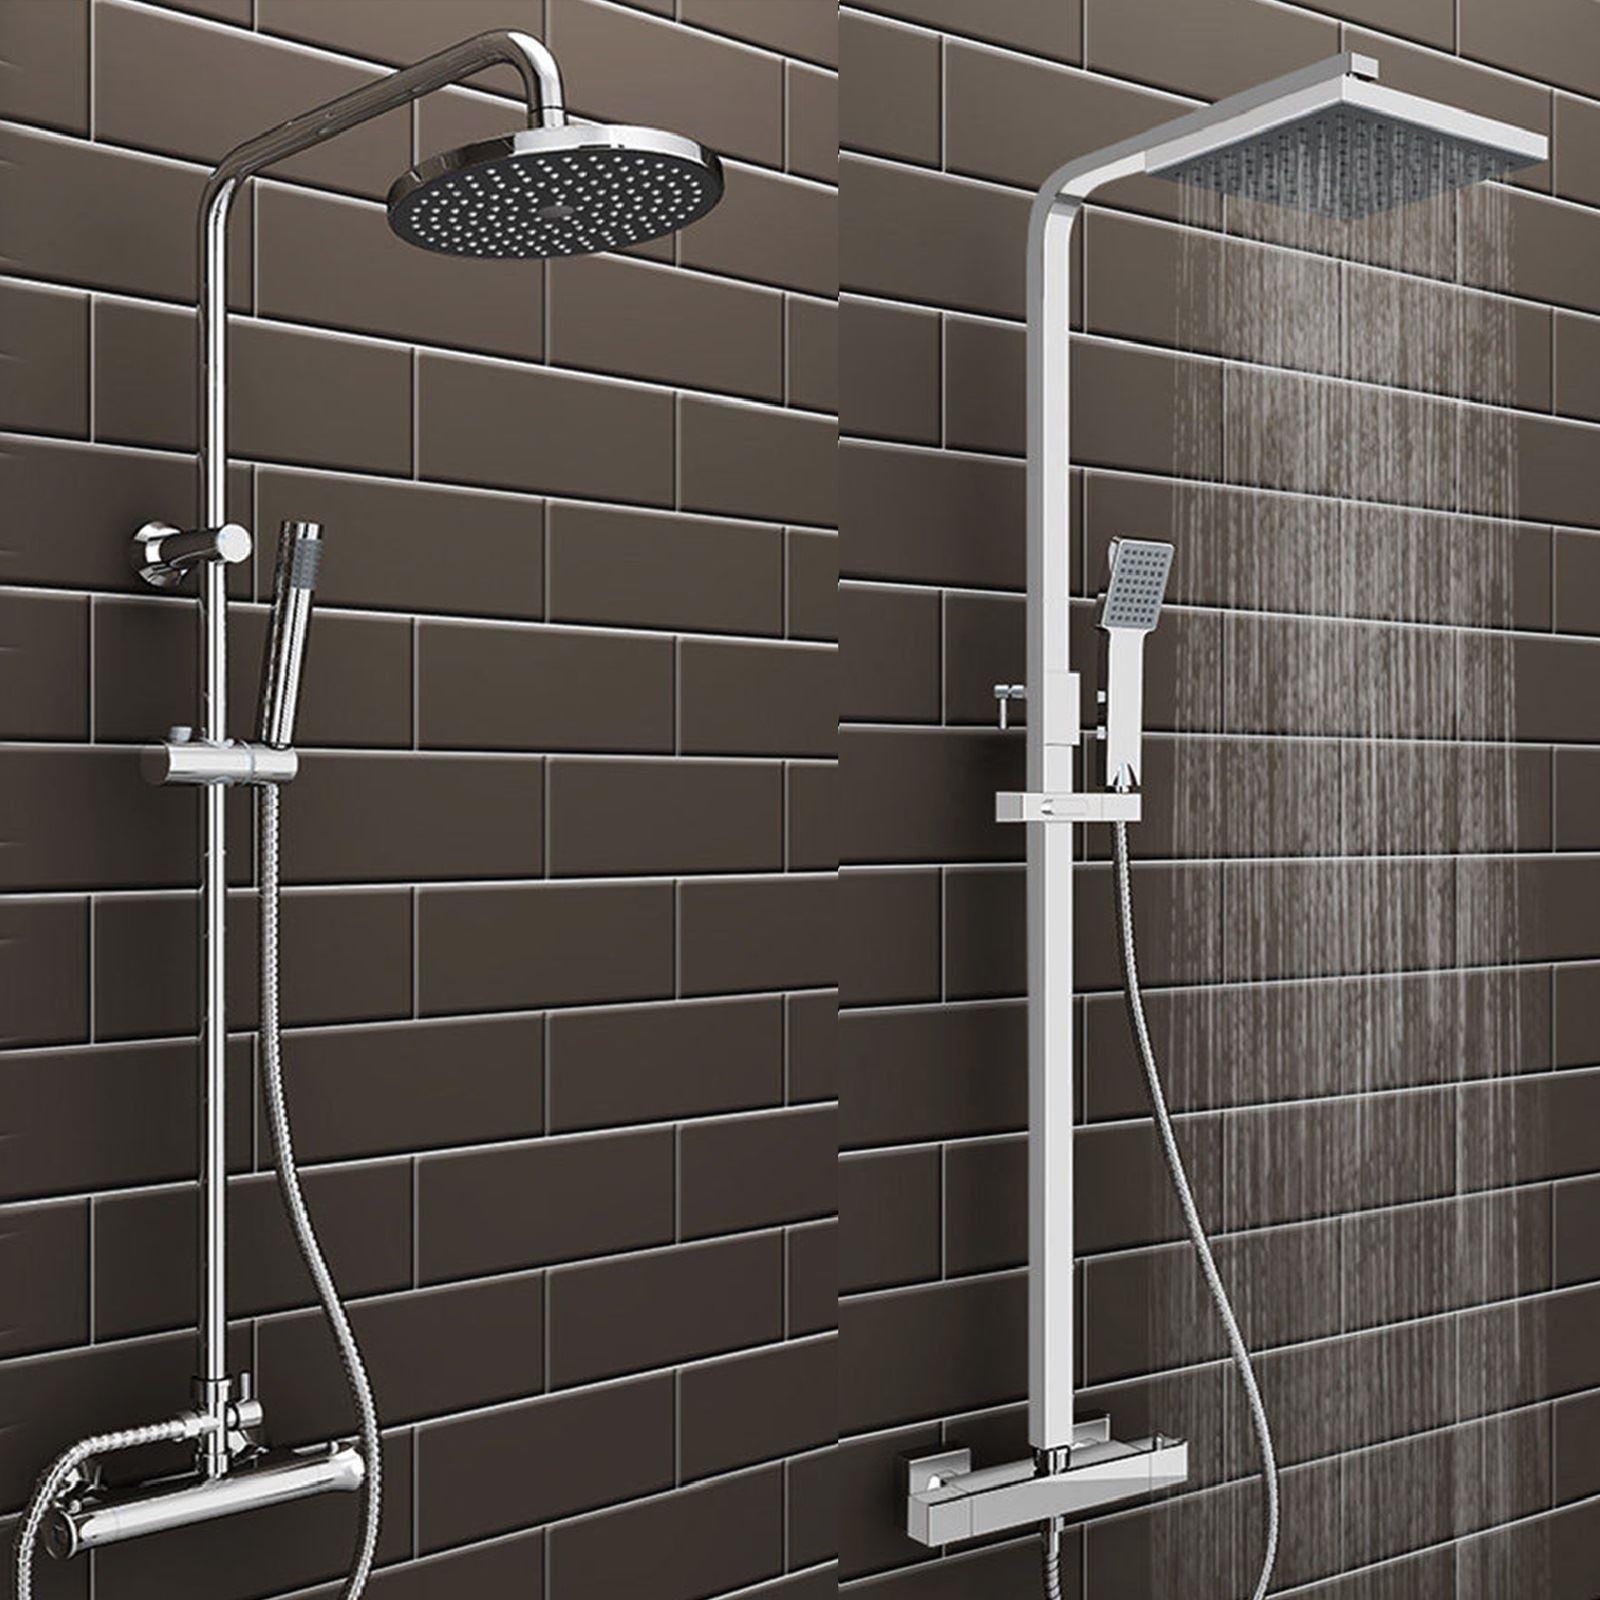 Rainfall 2 Head Bathroom Mixer Shower Set Round Square Chrome ...